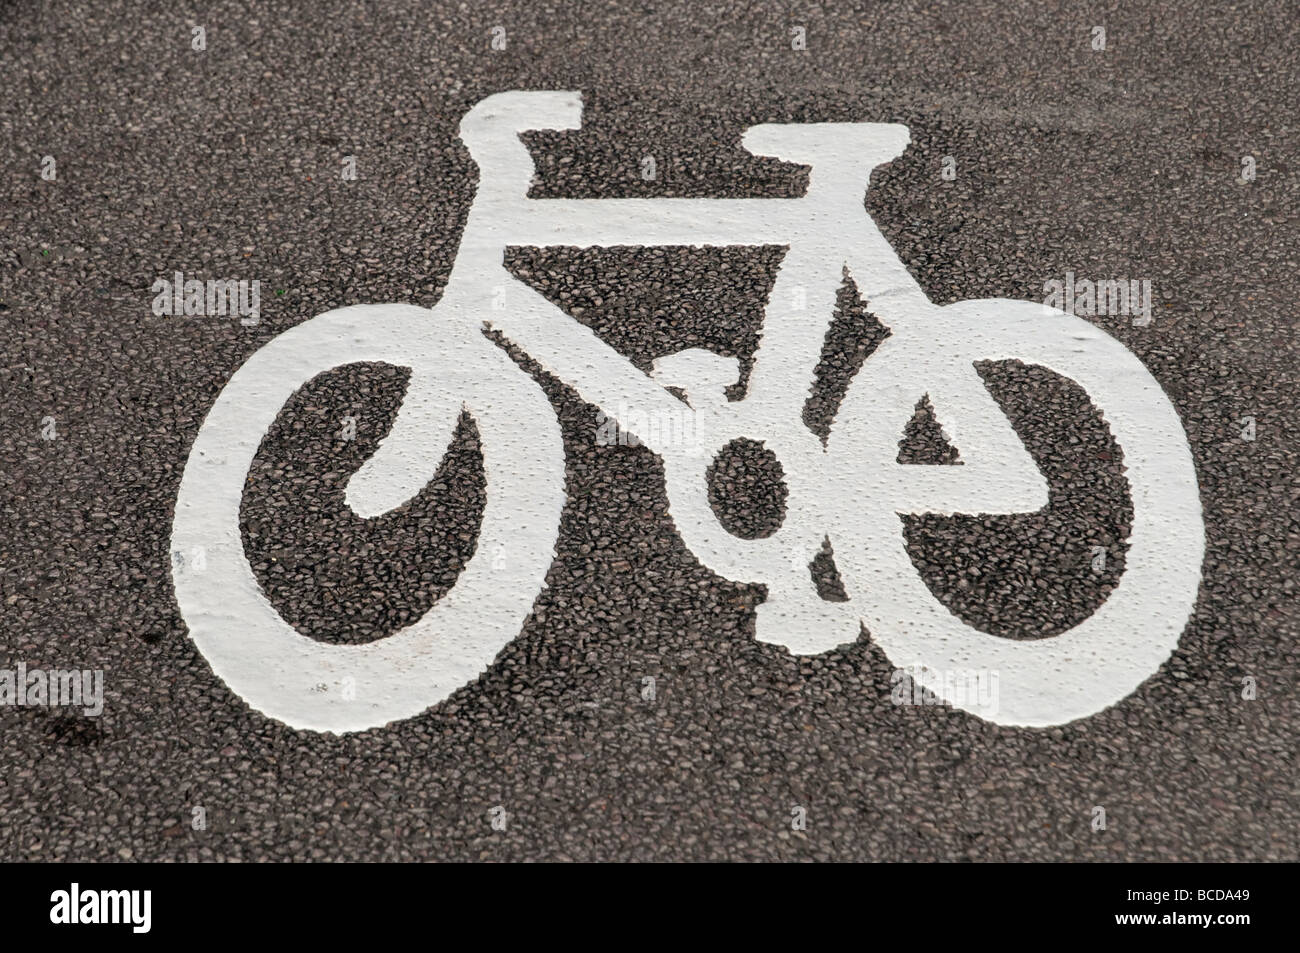 Zyklus Symbol Fahrbahn Markierung London England UK Stockbild